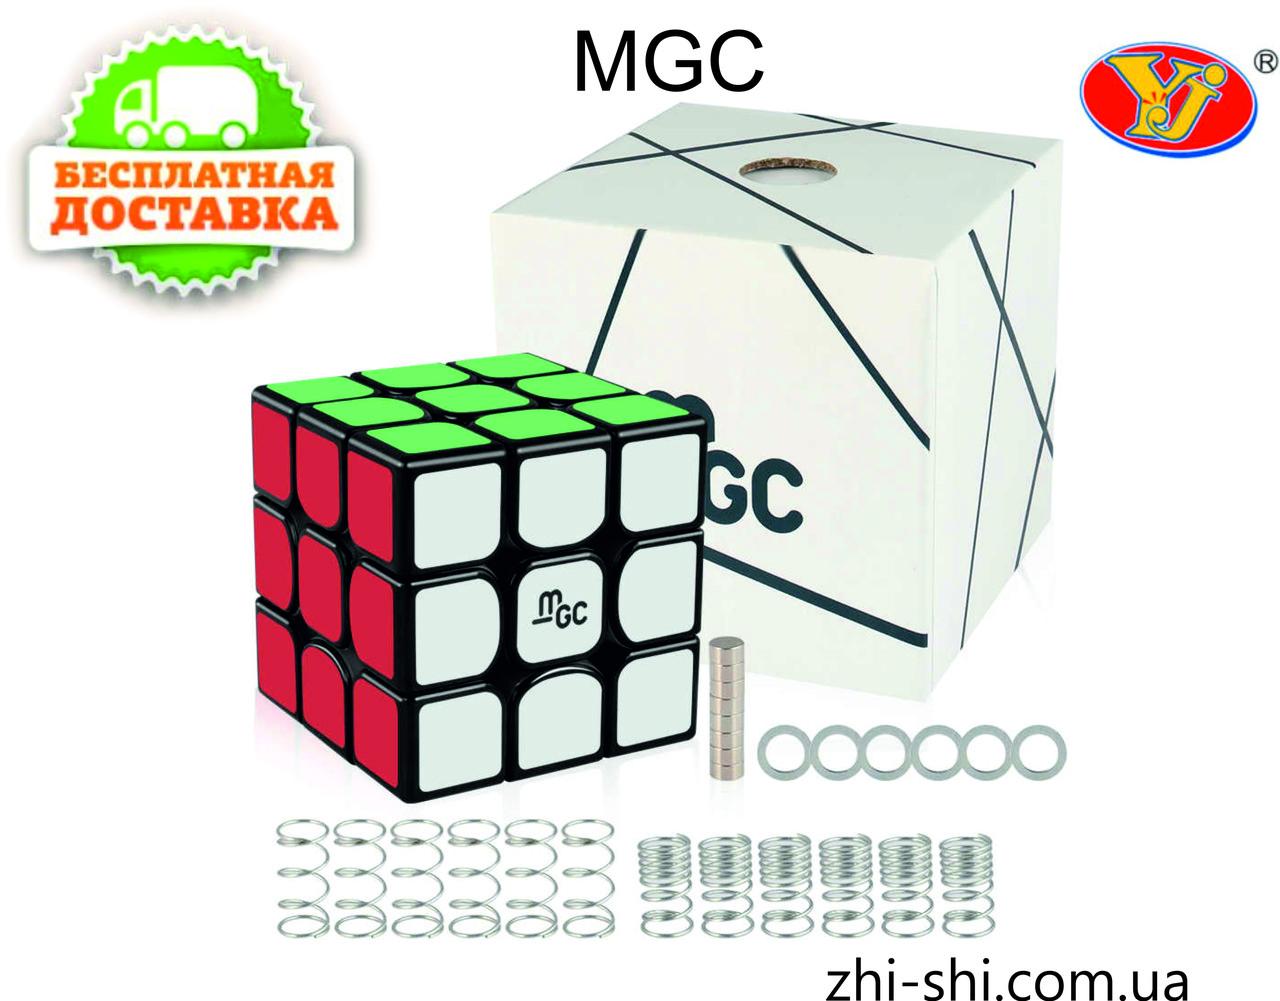 Кубик Рубика 3х3 MGC (Magnetic) чёрный MoYu YJ